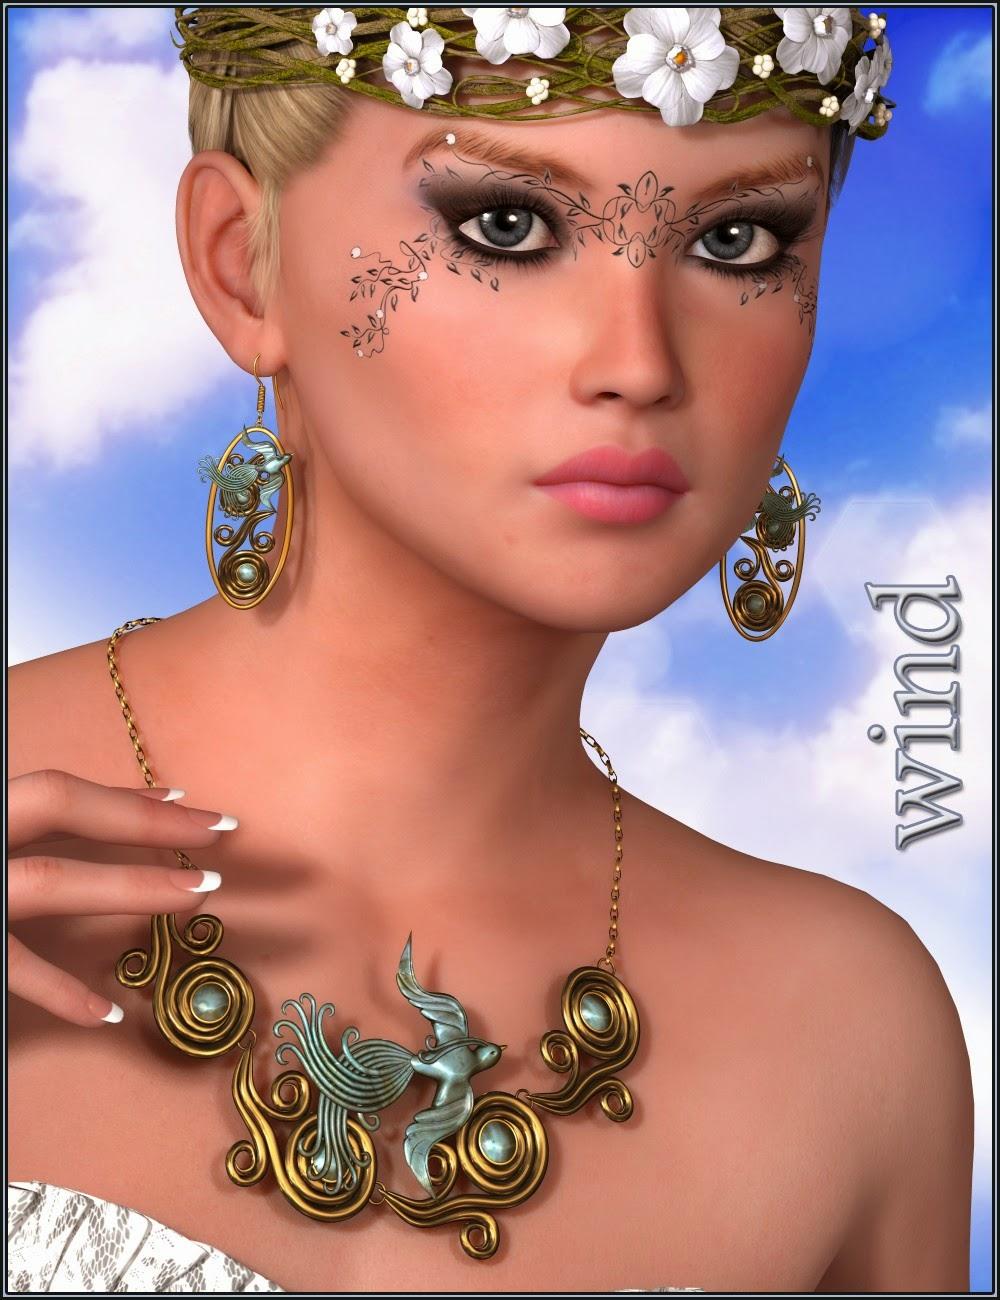 3d Models Art Zone - Elemental Jewelry: Fire, Earth, Wind, and Water